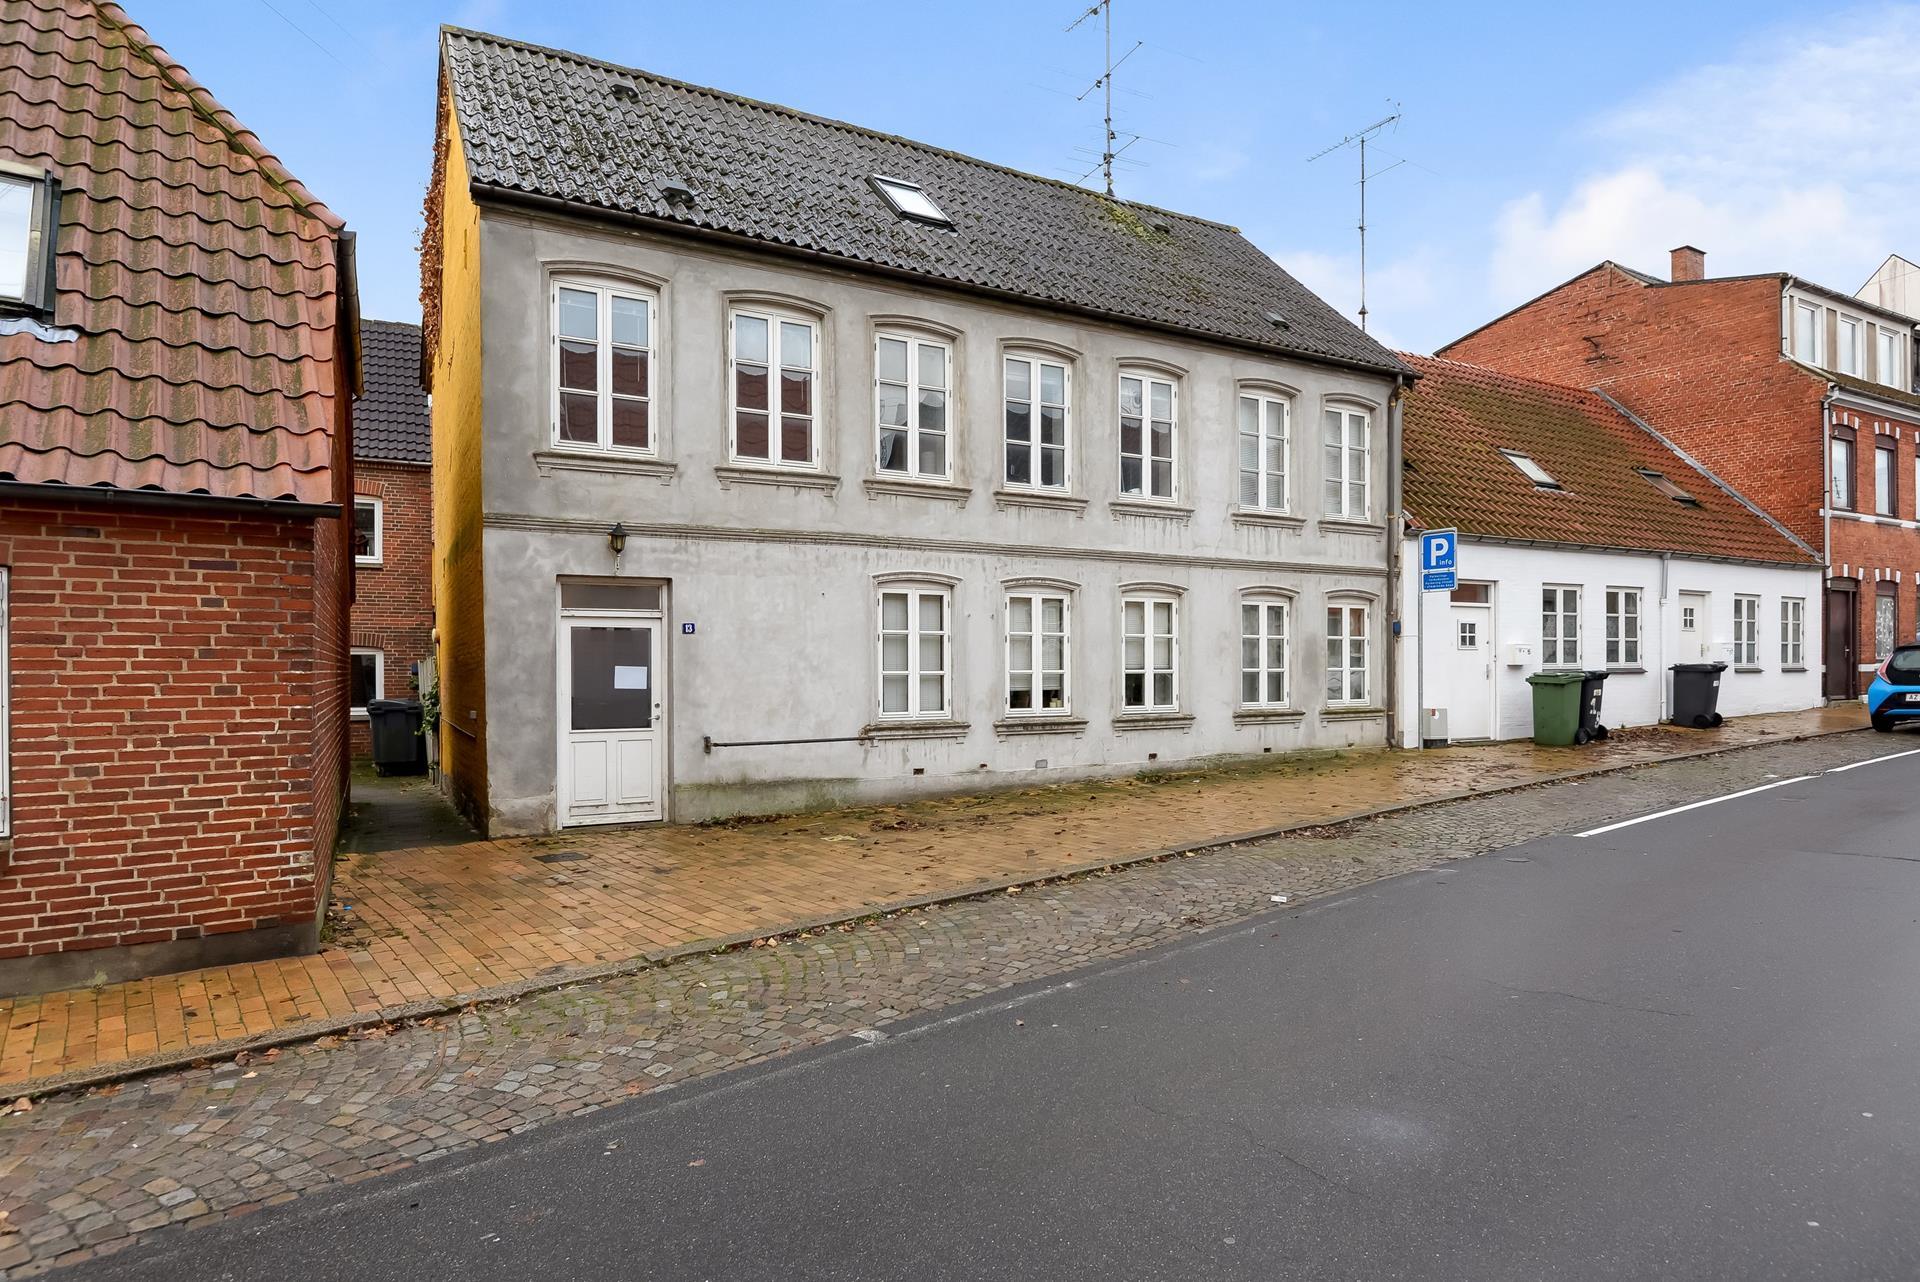 Boligudlejning på Slagtergade i Haderslev - Facade